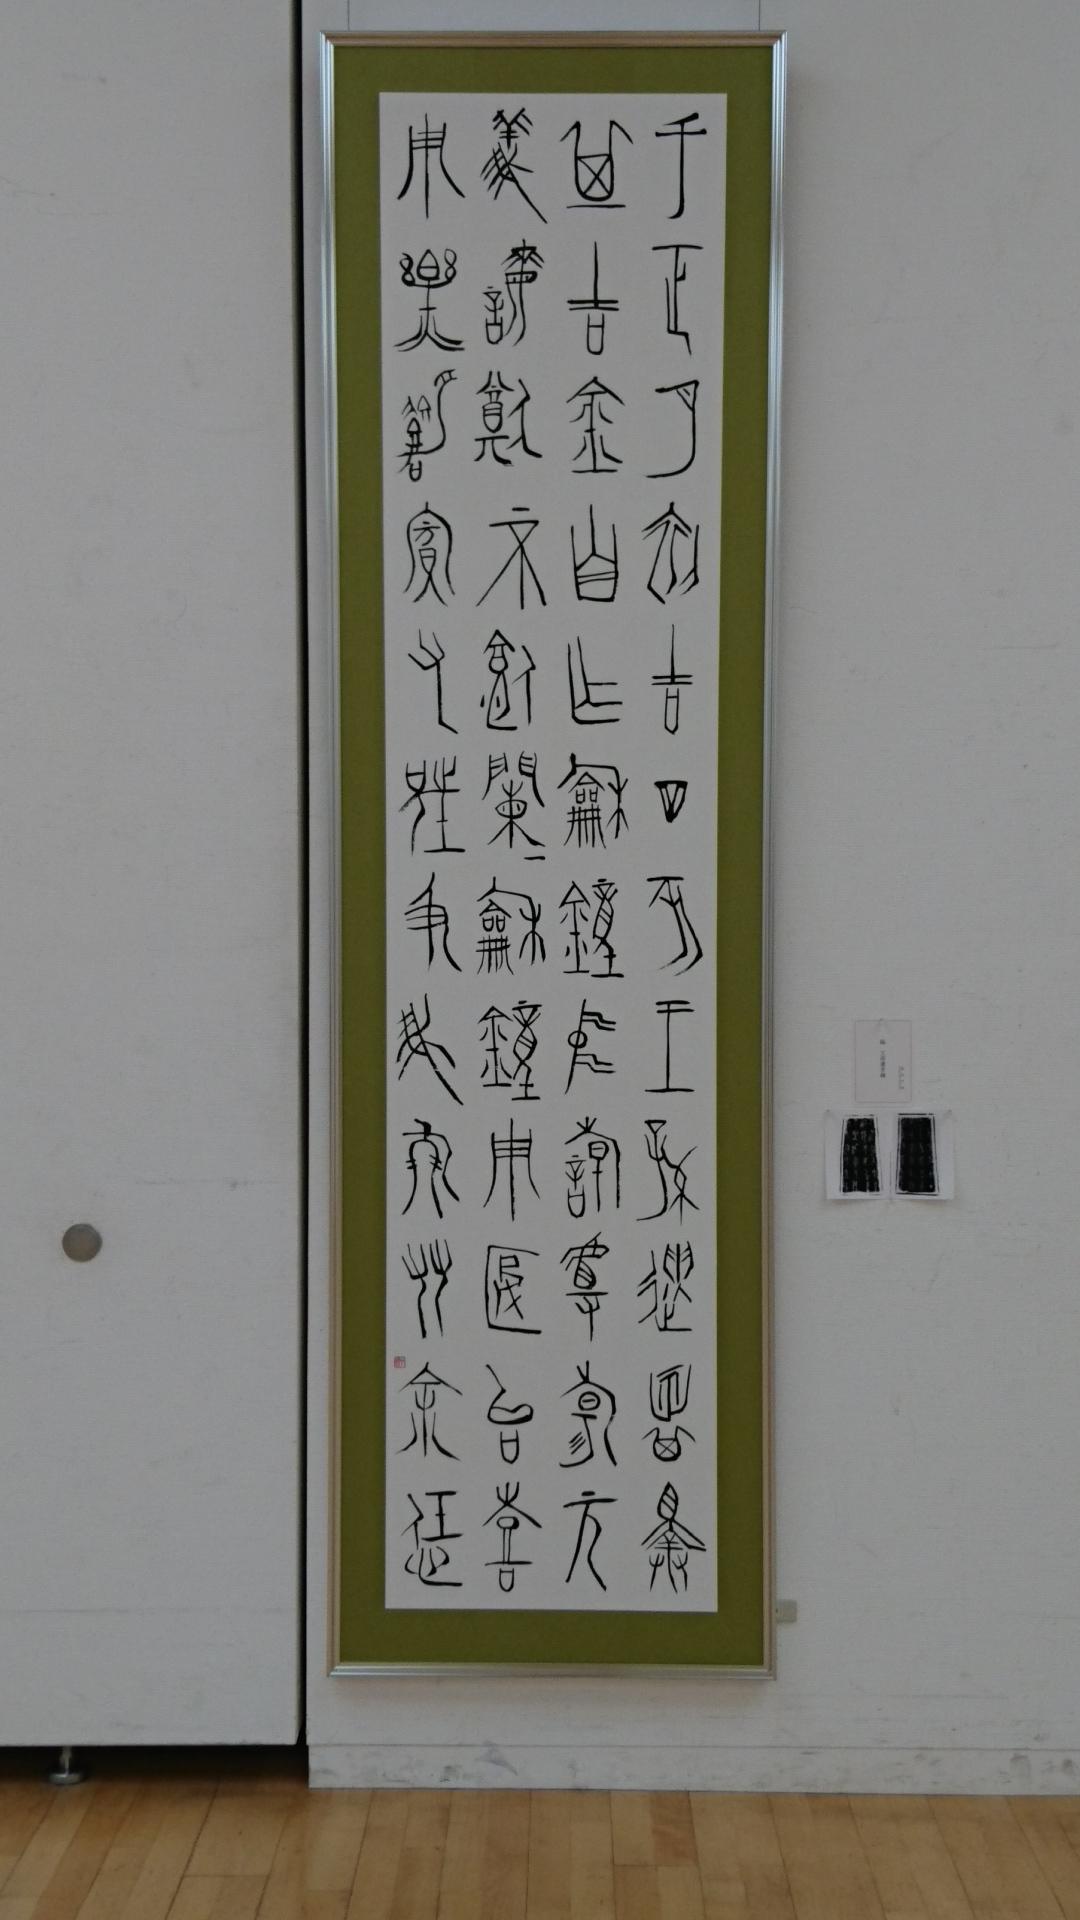 2016.12.3 夕照会書展 (4) 臨 - 王孫遺者鐘 - 稲垣竹径さん